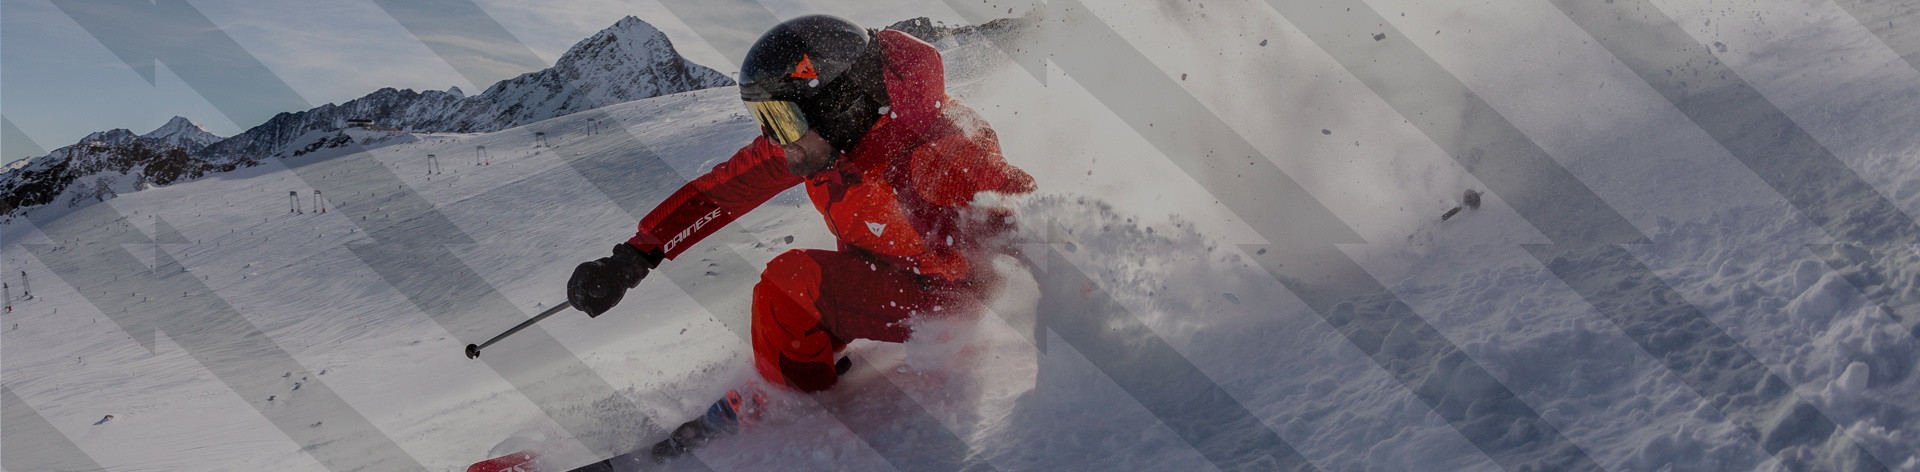 Dainese Winter Sale 2020 - Winter Sports